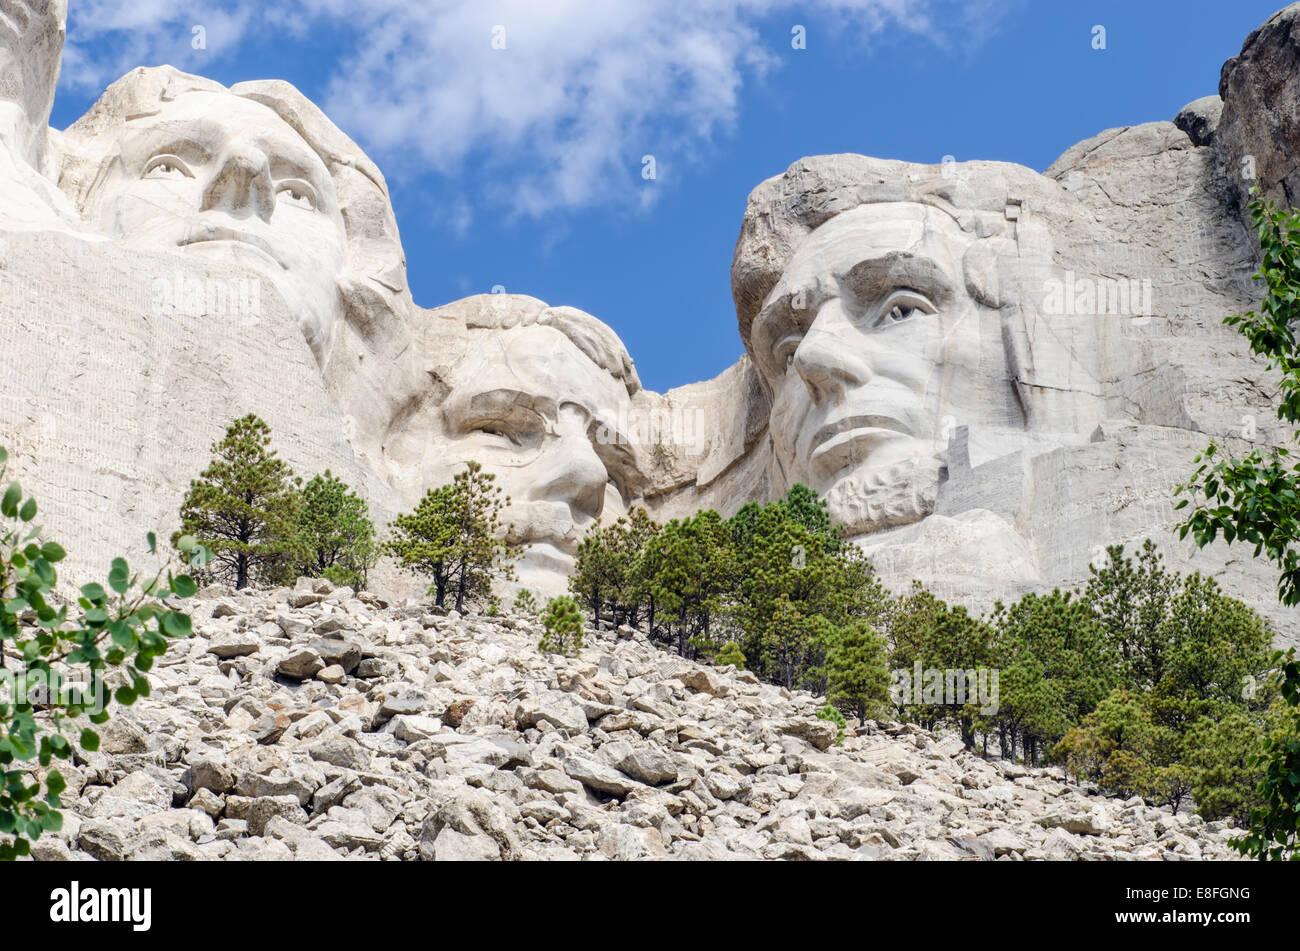 Mt Rushmore National Monument, South Dakota, USA Stock Photo